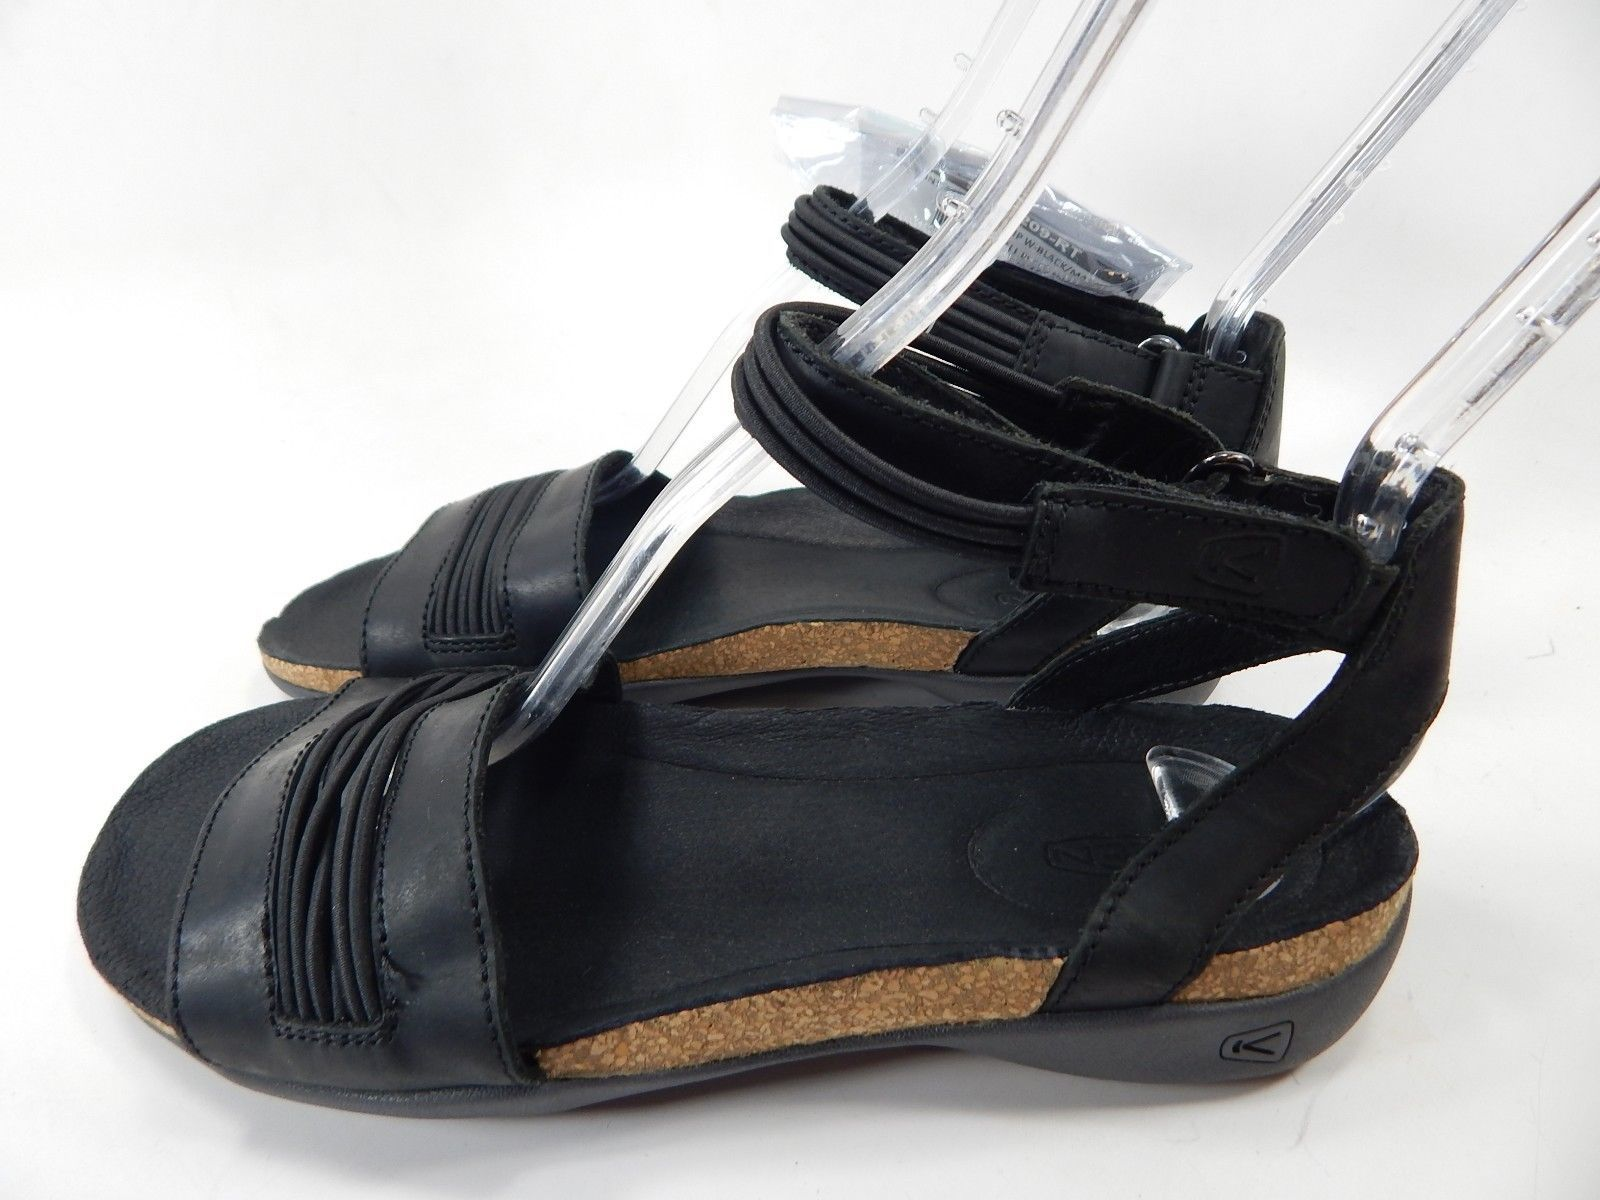 Keen Dauntless Ankle Women's Sports Sandals Size US 7 M (B) EU 37.5 Black Magnet